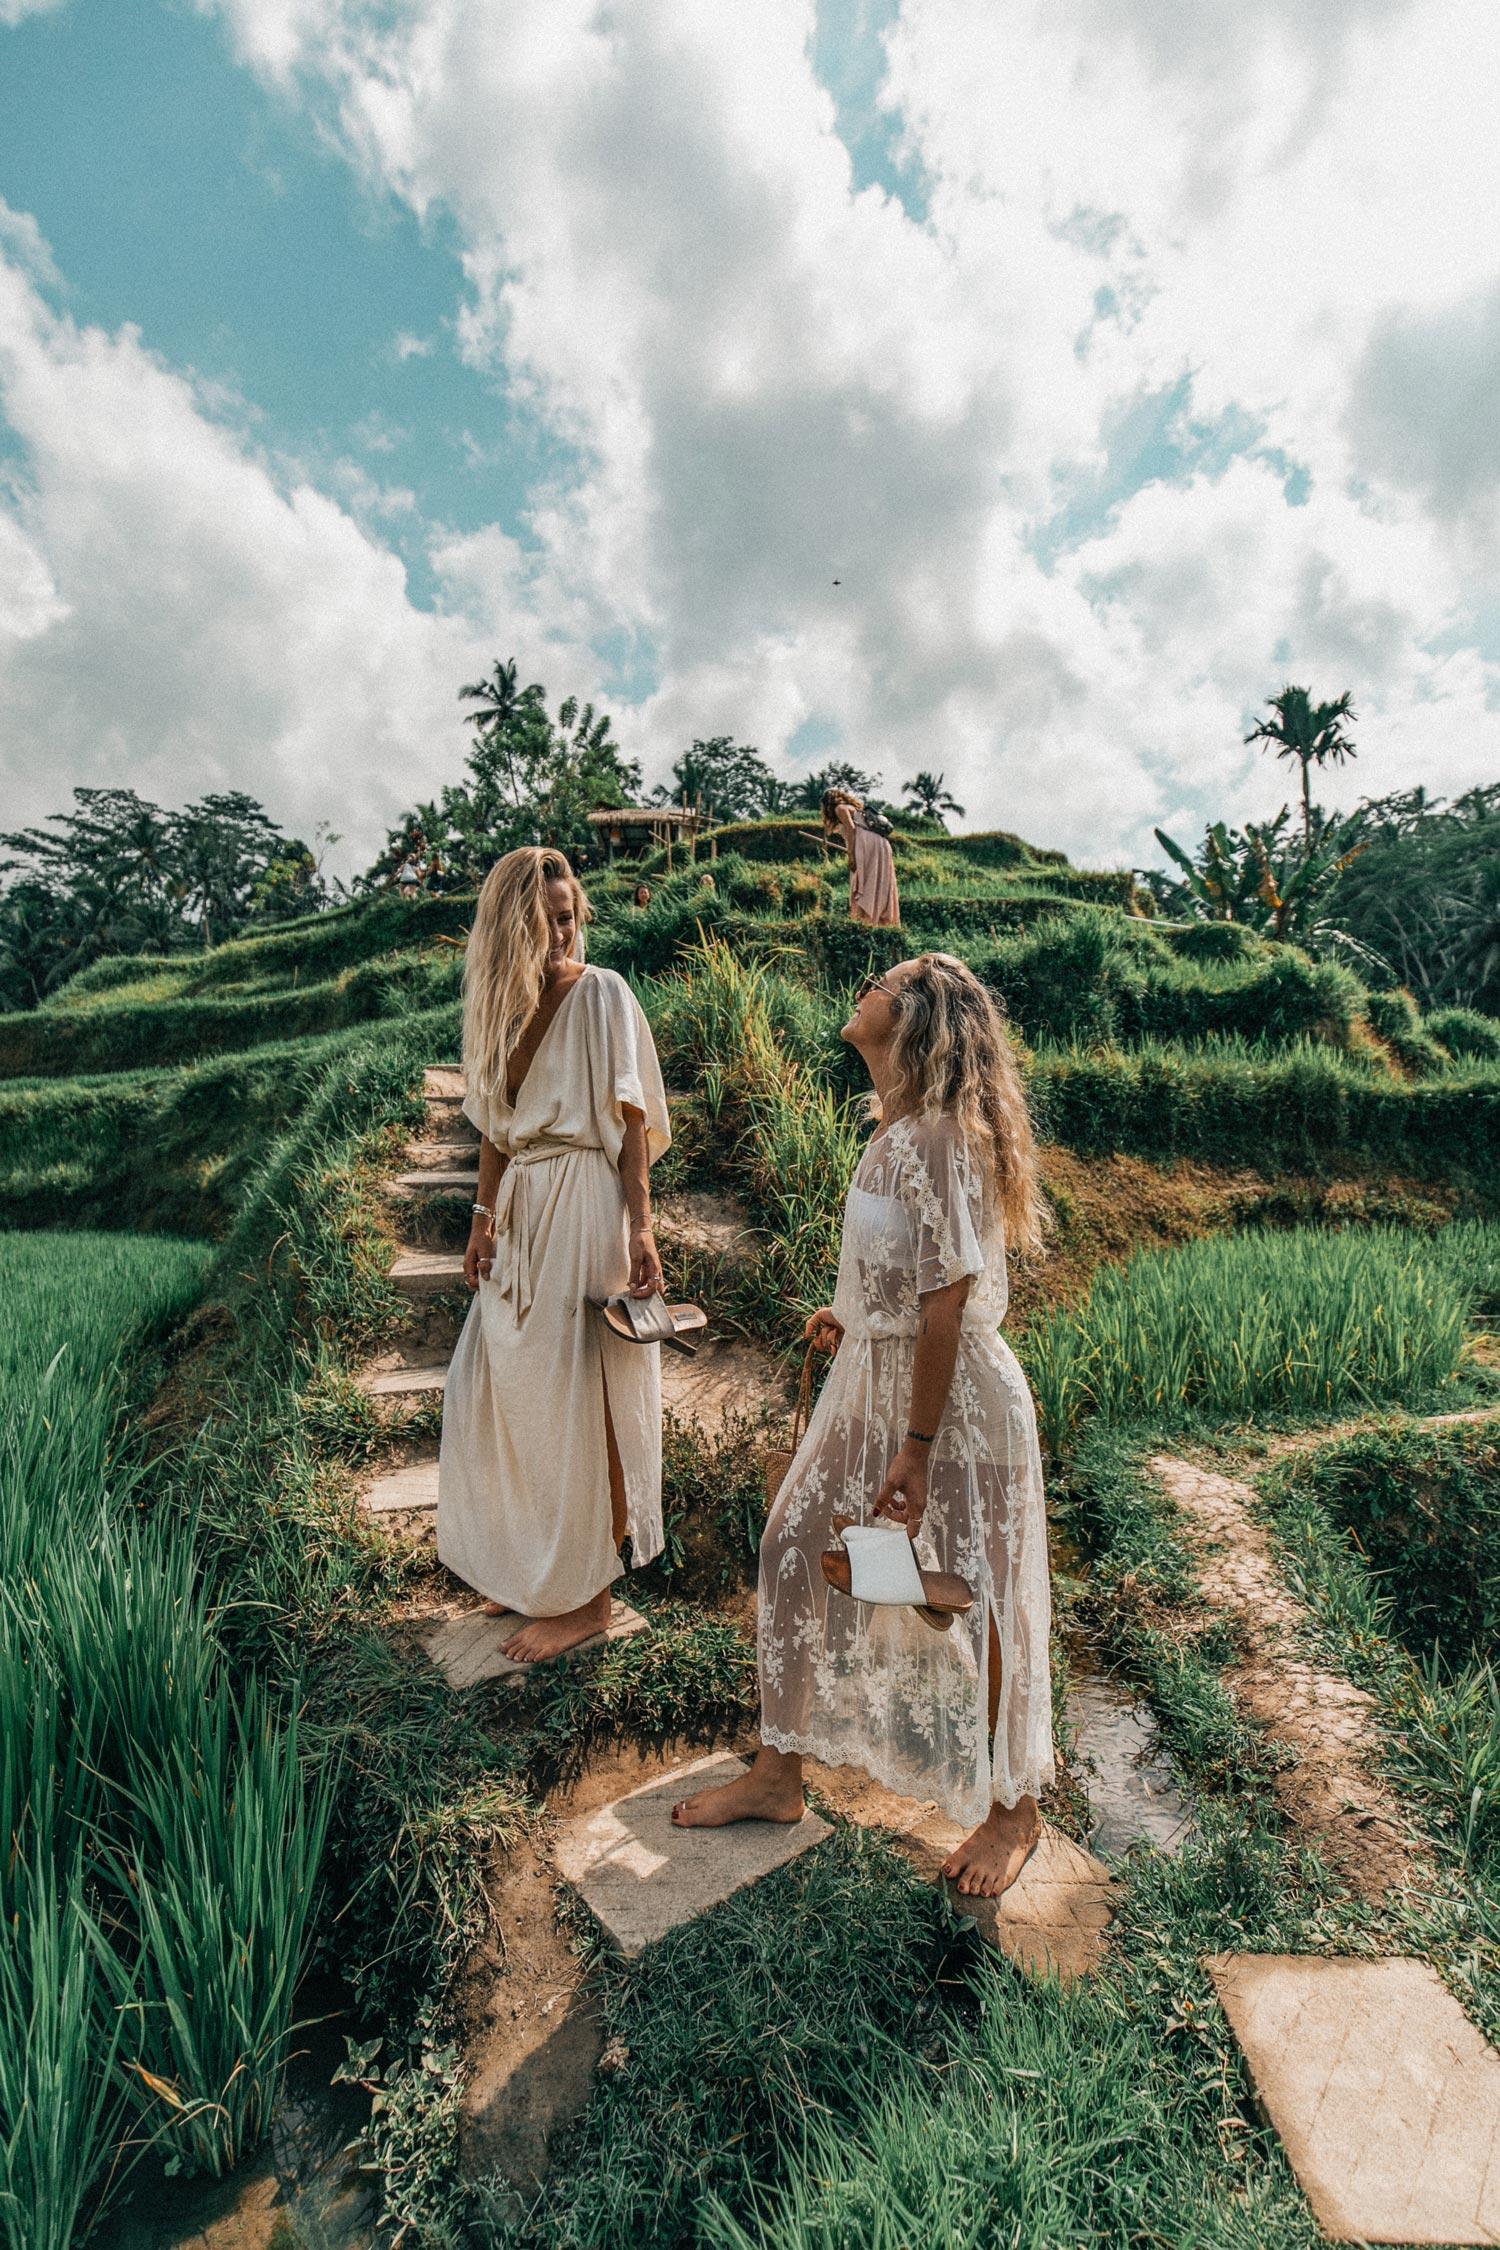 bali-indonesia-yoga-retreat-travel-photography-21.jpg